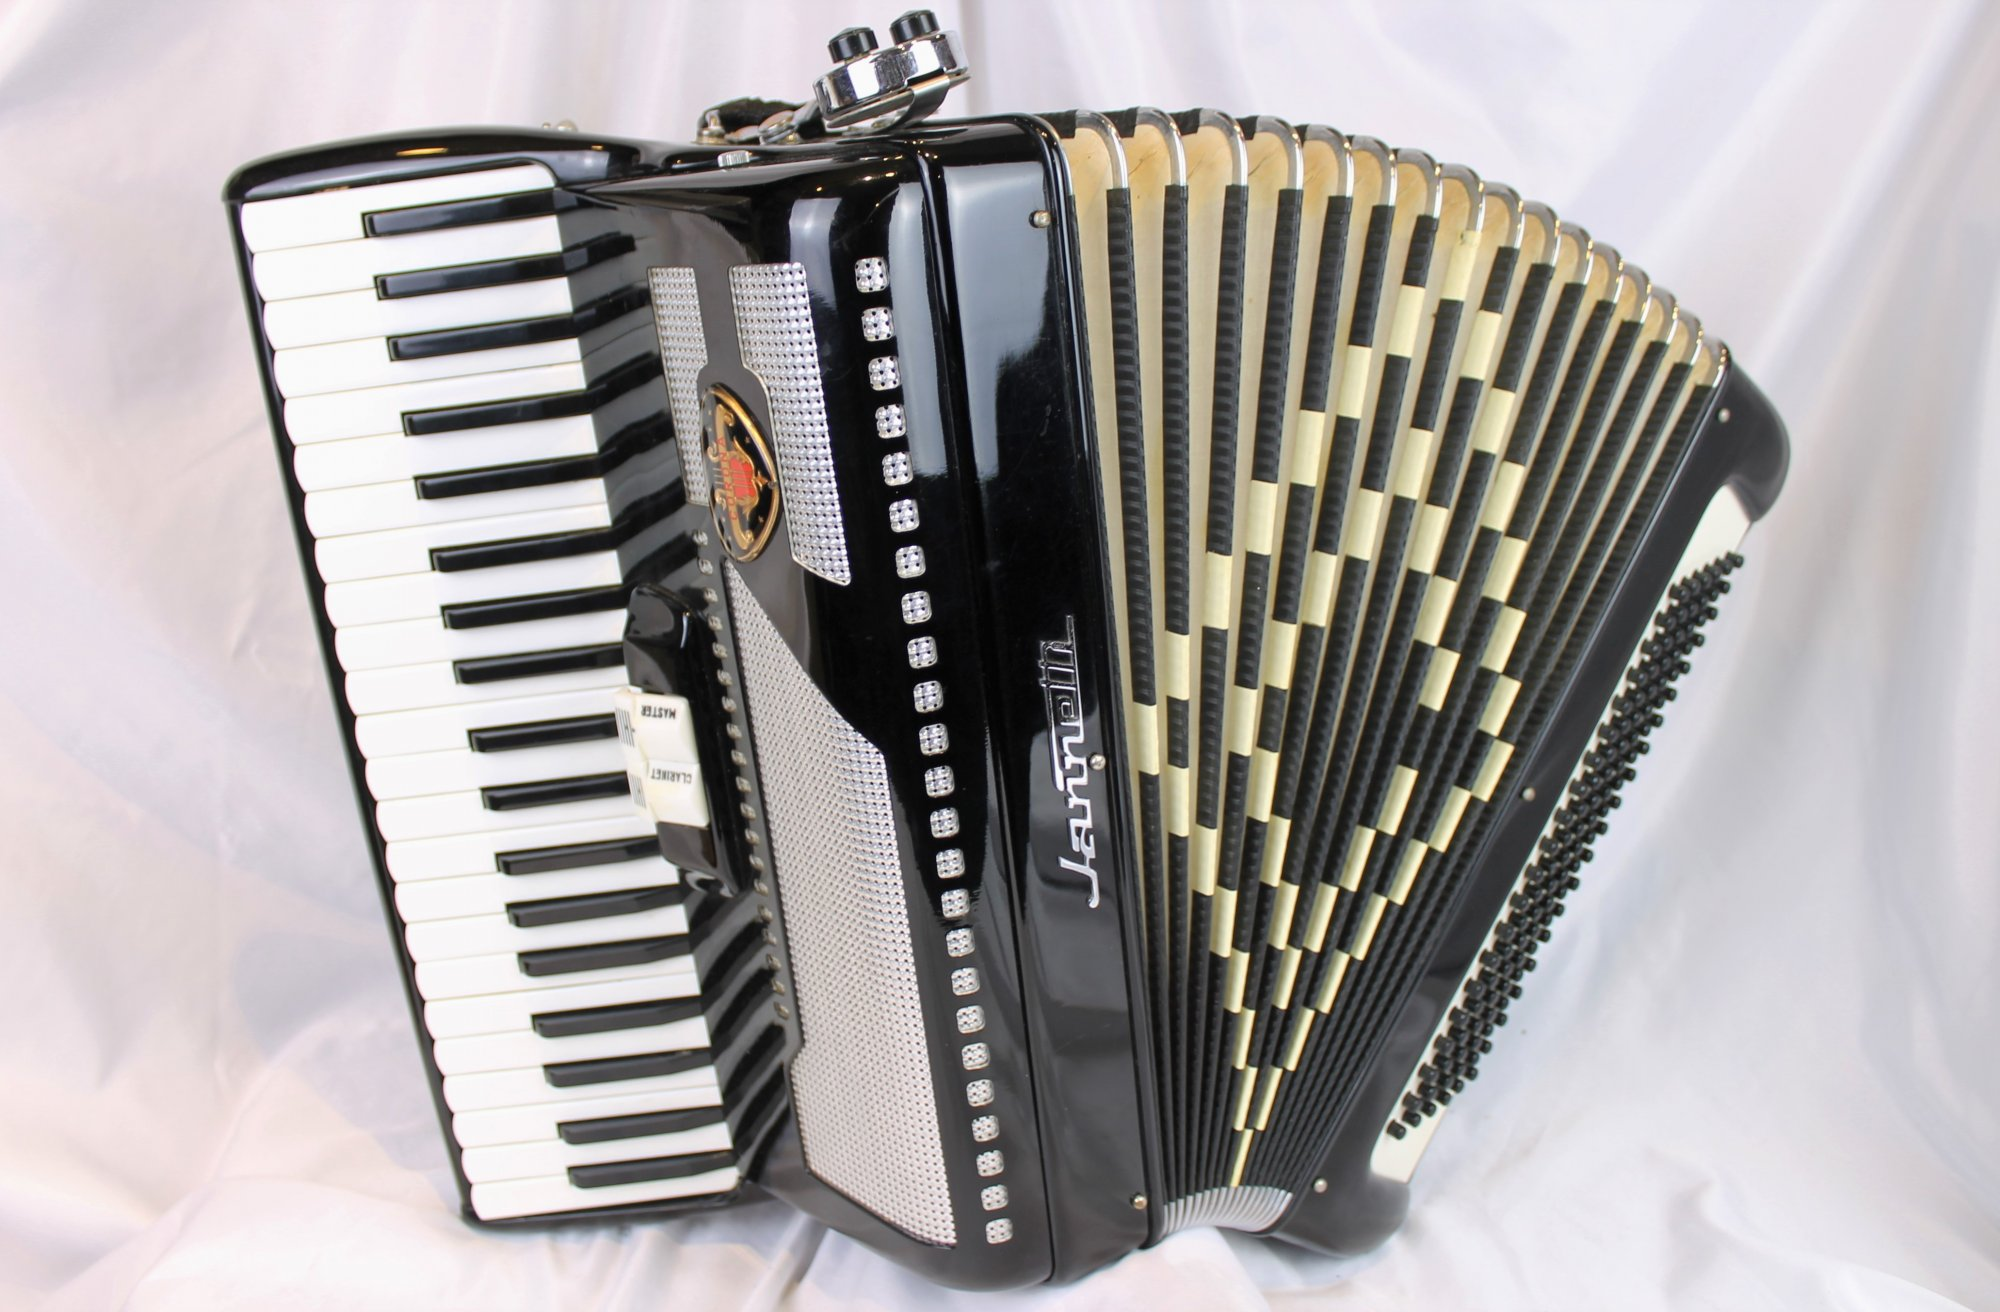 4507 - Black Jannetti Corona Piano Accordion LM 41 120